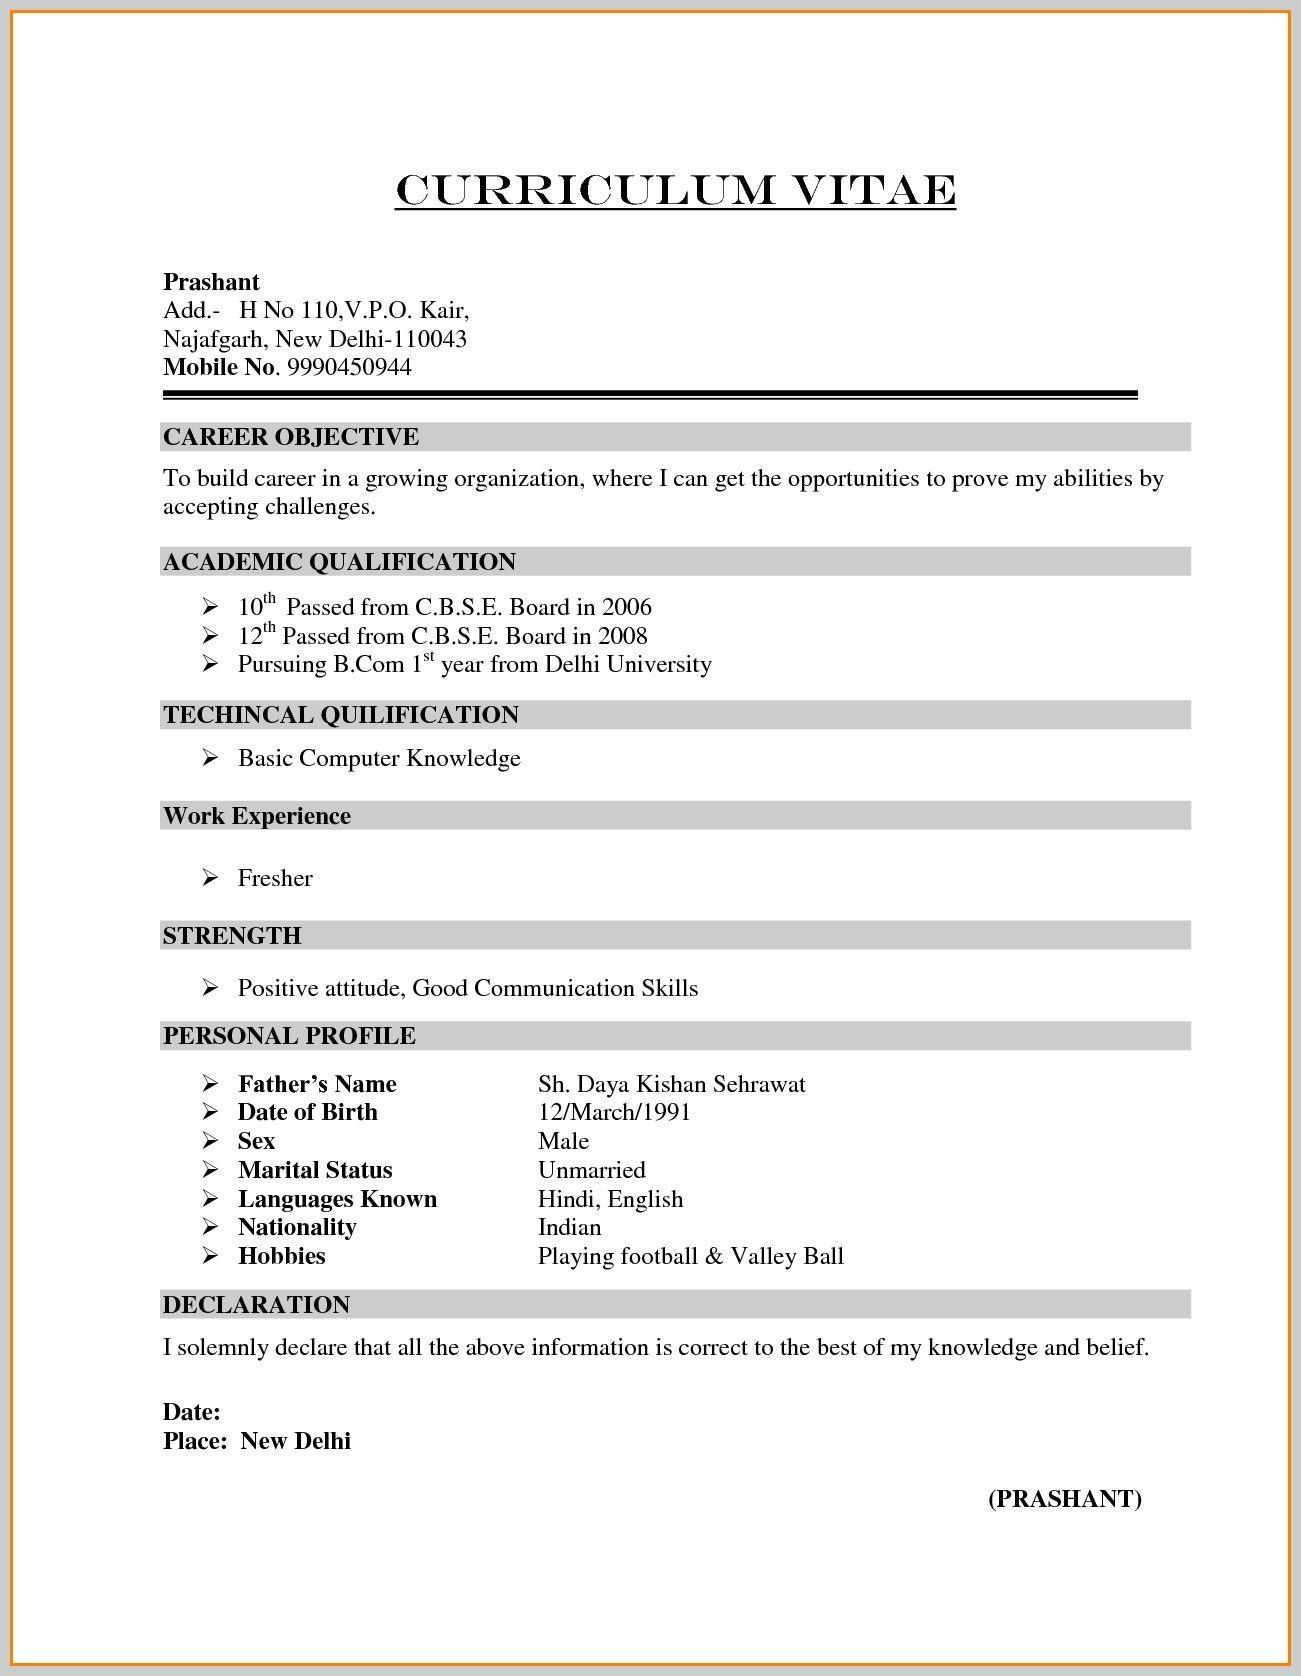 Resume Format Pdf Download For Freshers Bcom